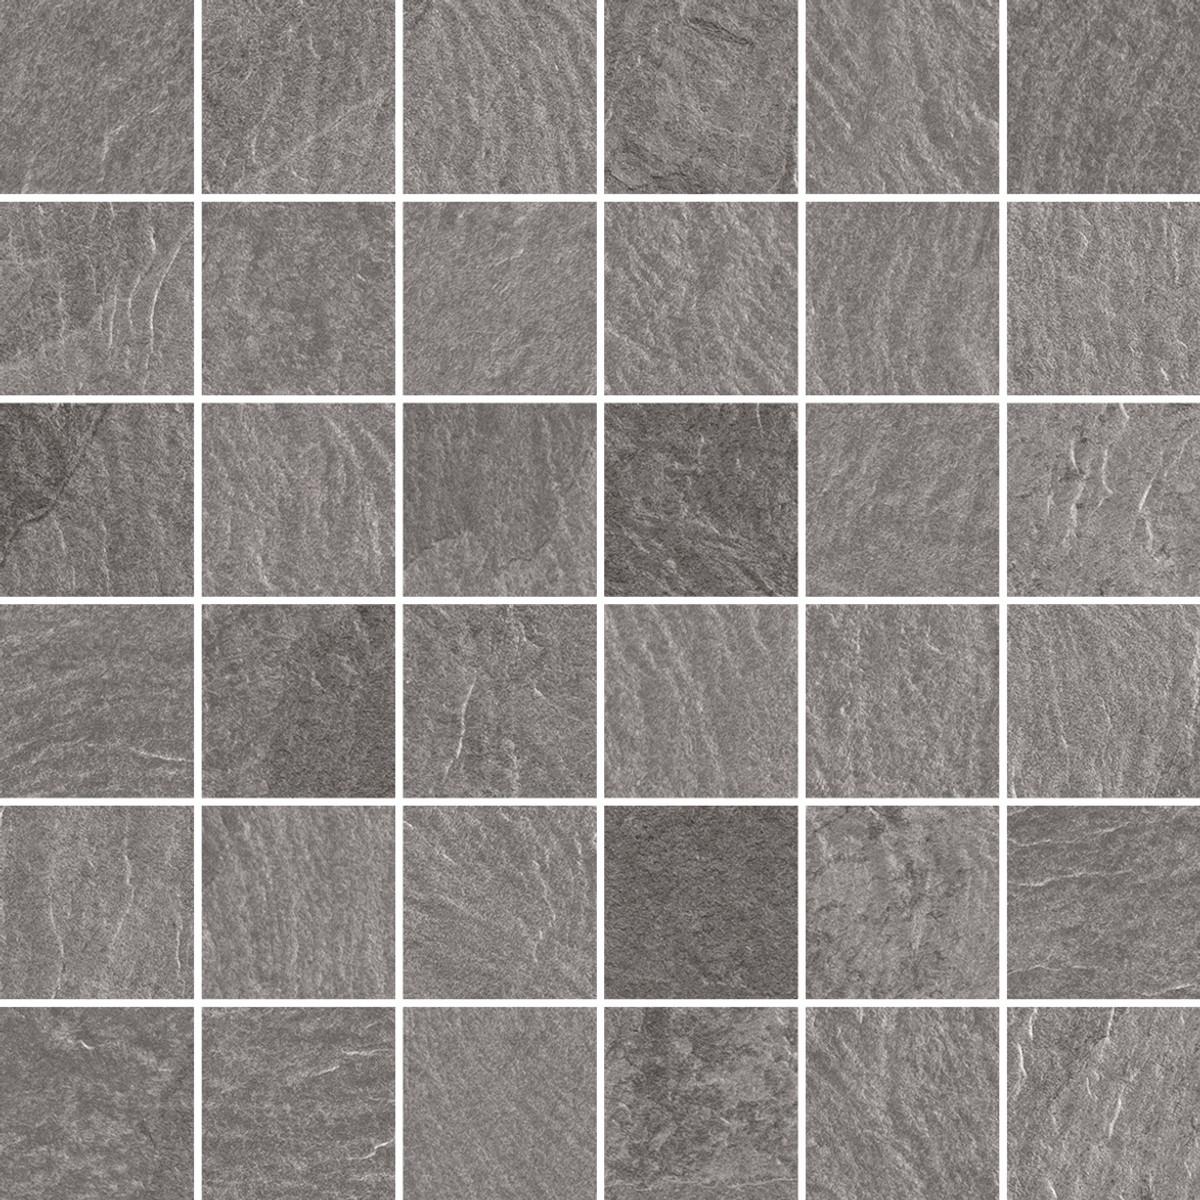 Mosaik Gazzini Slide grey Mosaik 5 x 5 cm